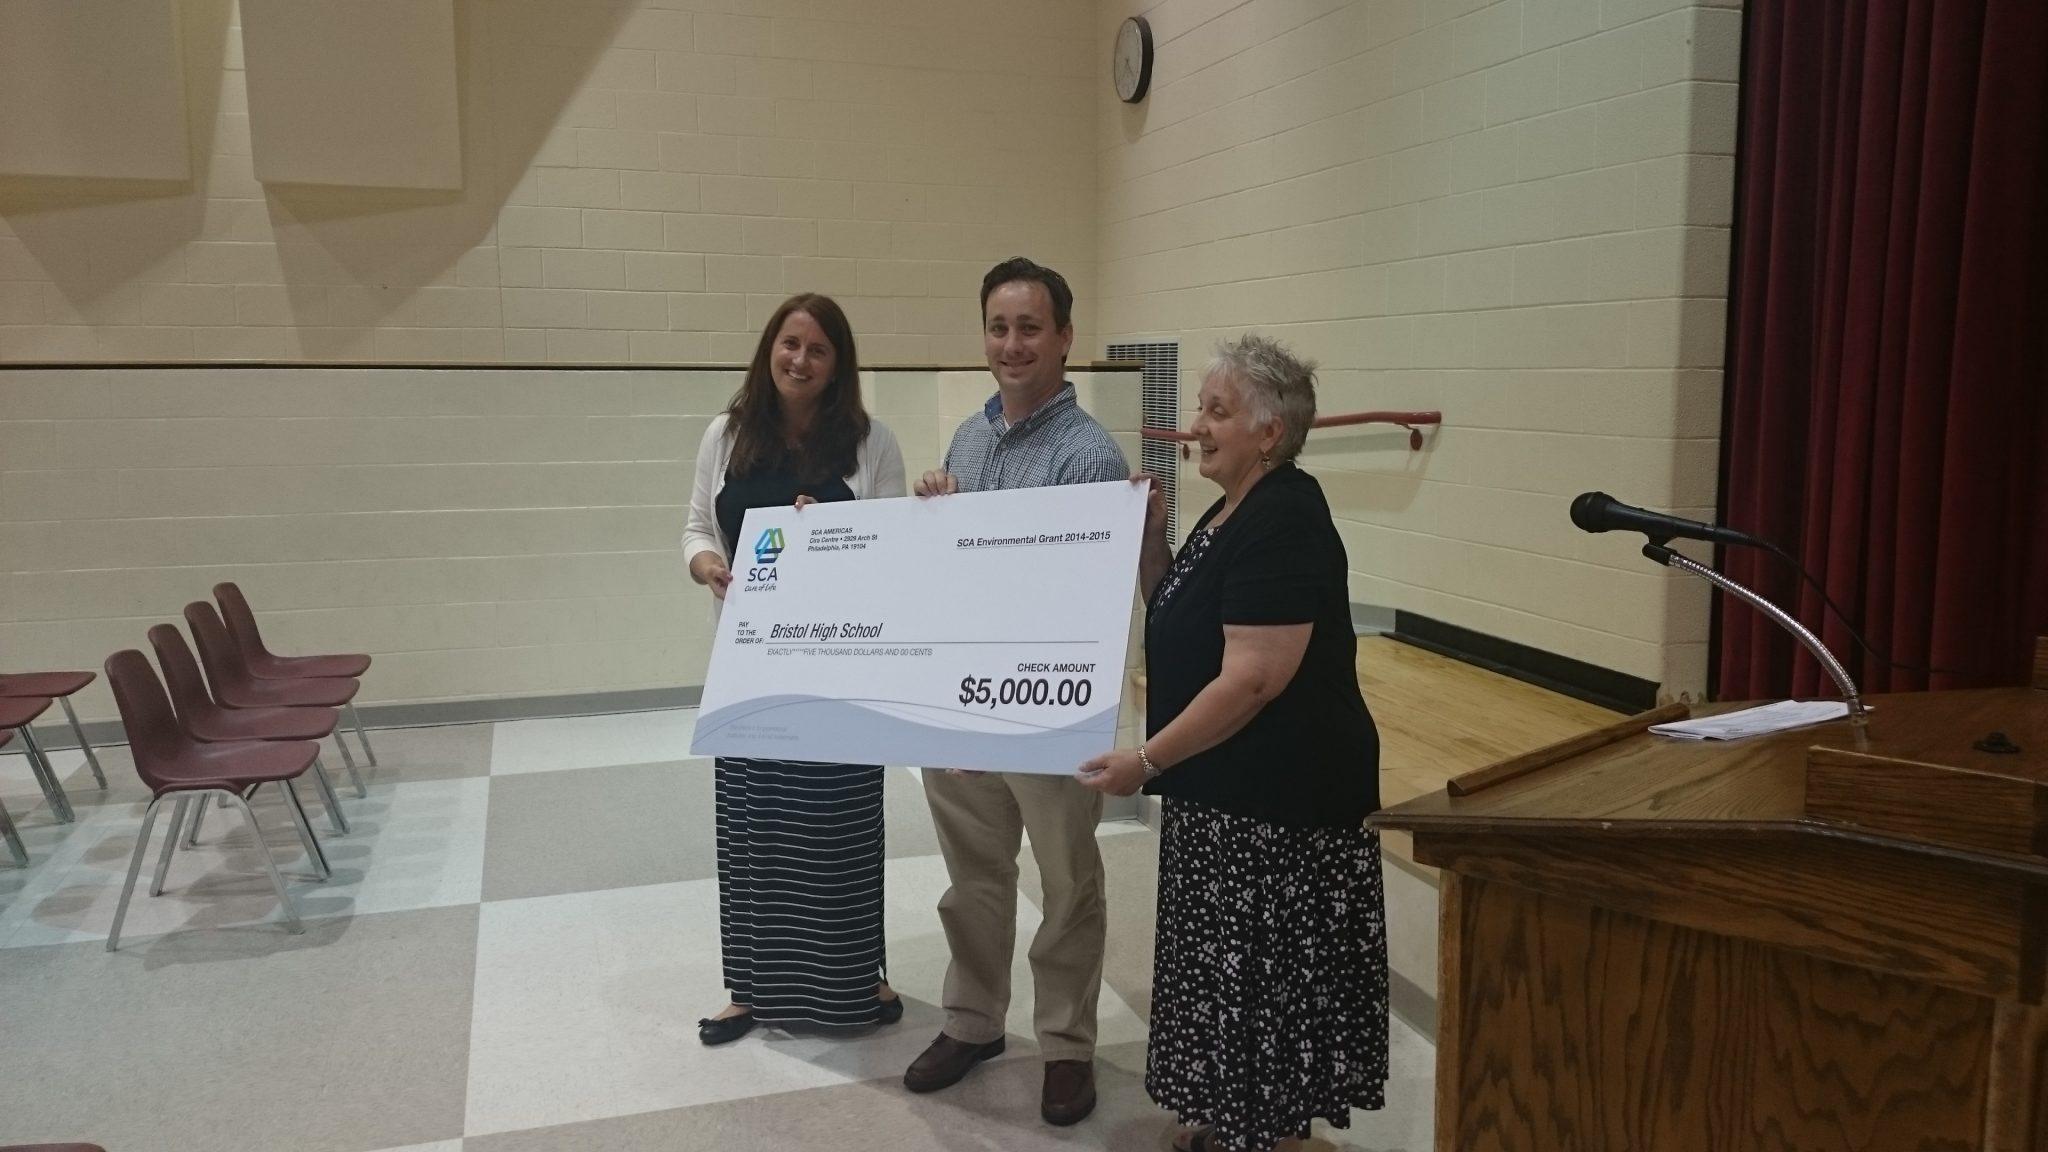 Bristol Club Gets $5,000 Grant